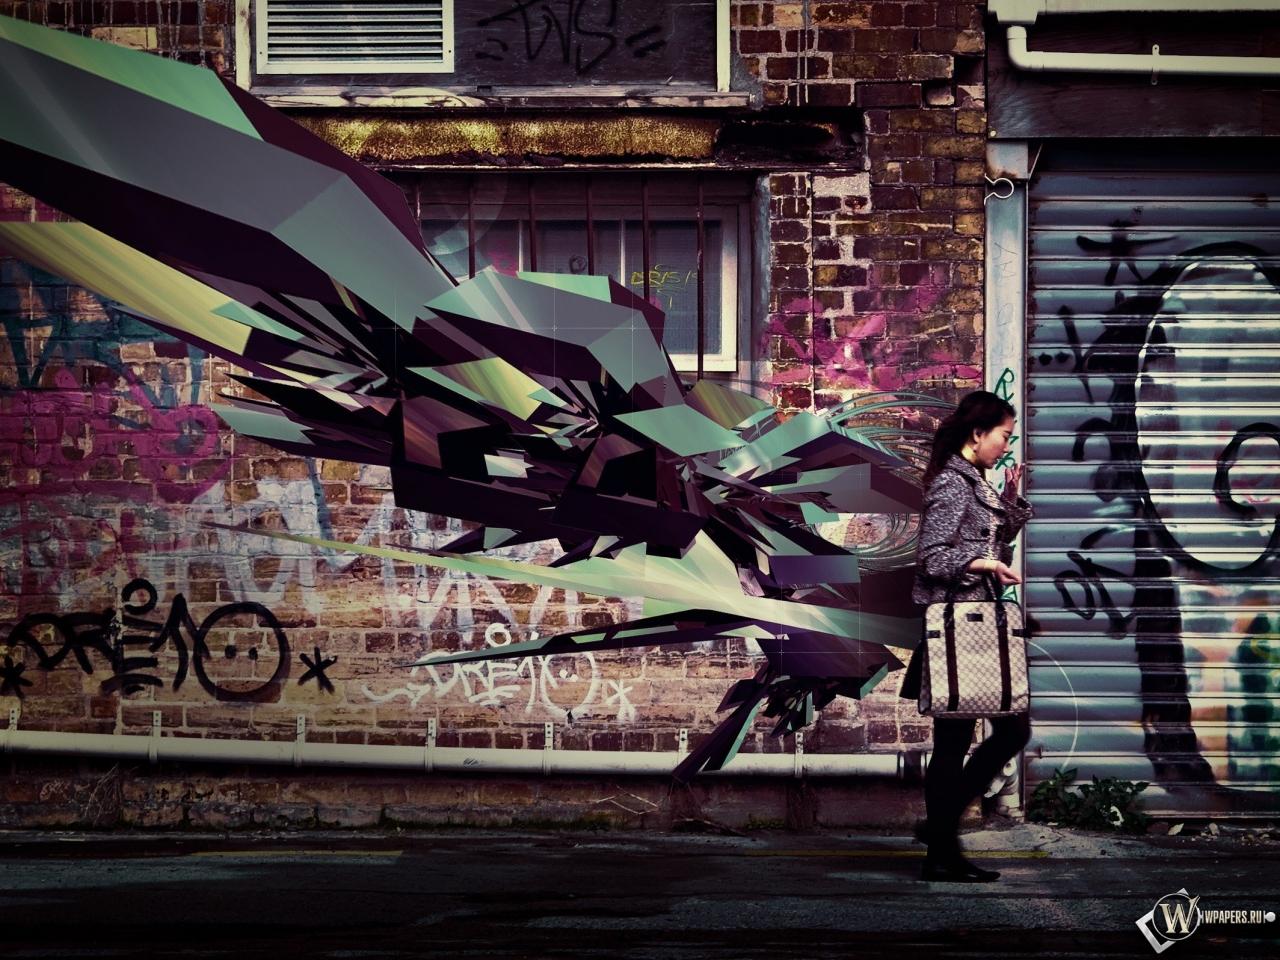 Обои 3d граффити на рабочий стол с